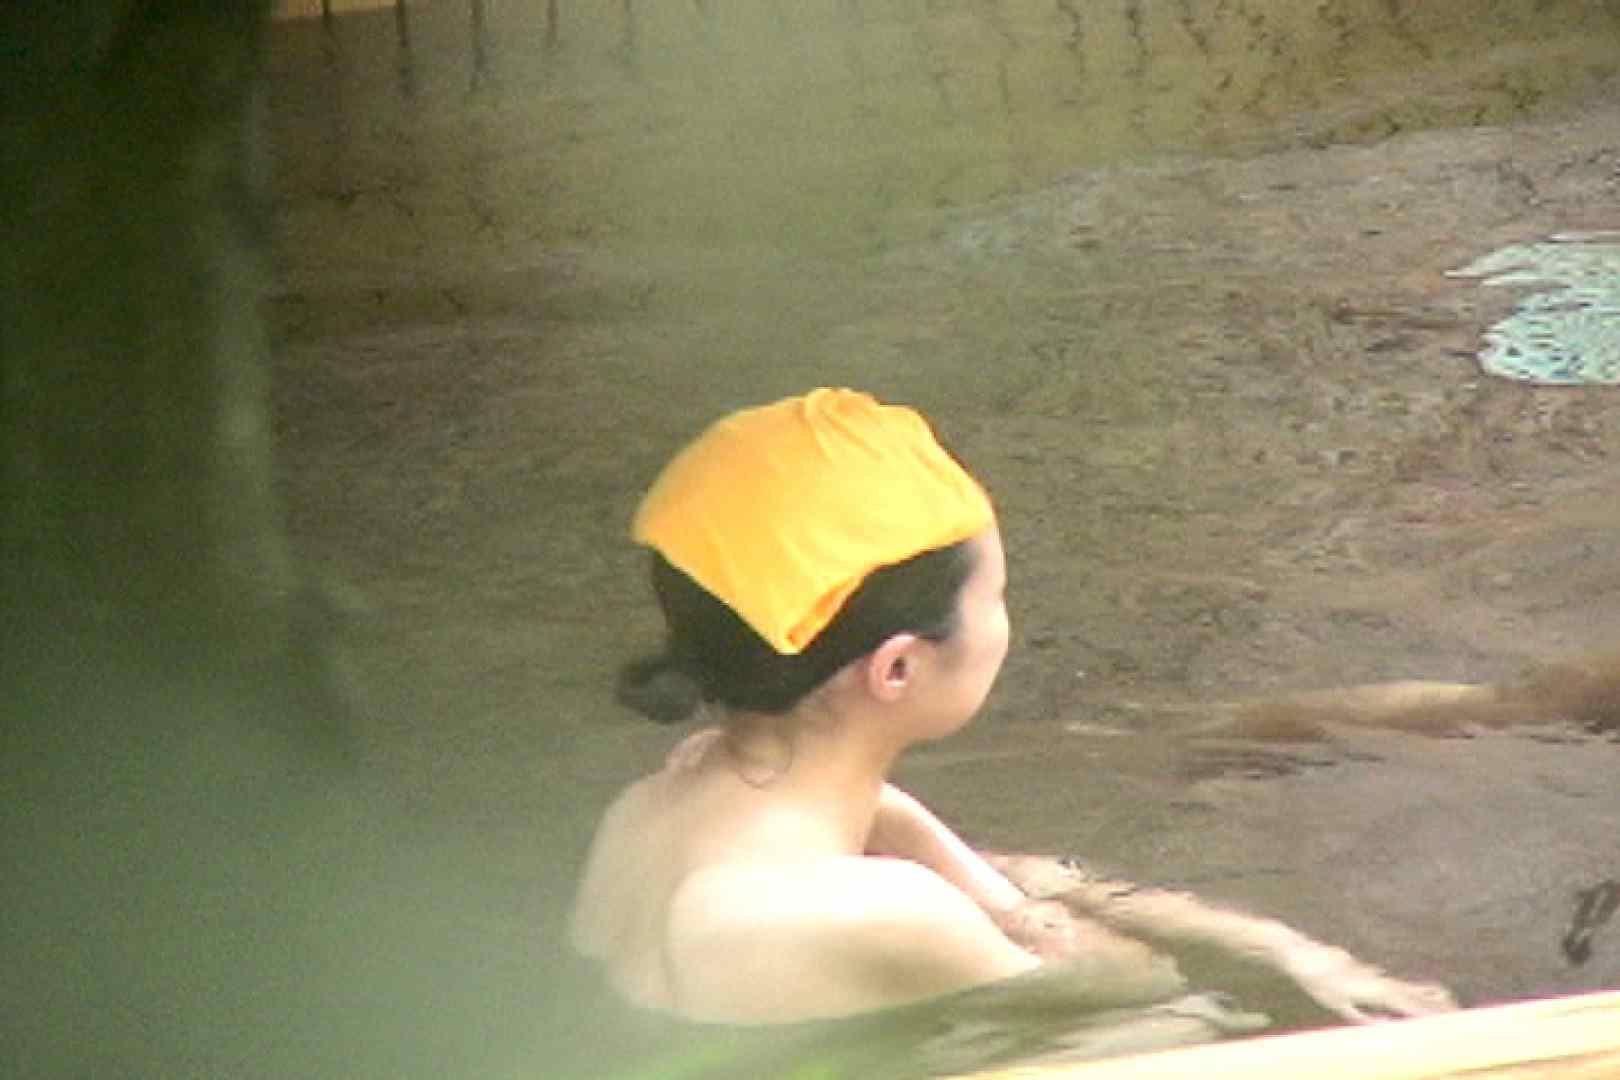 Aquaな露天風呂Vol.453 0 | 0  66連発 15